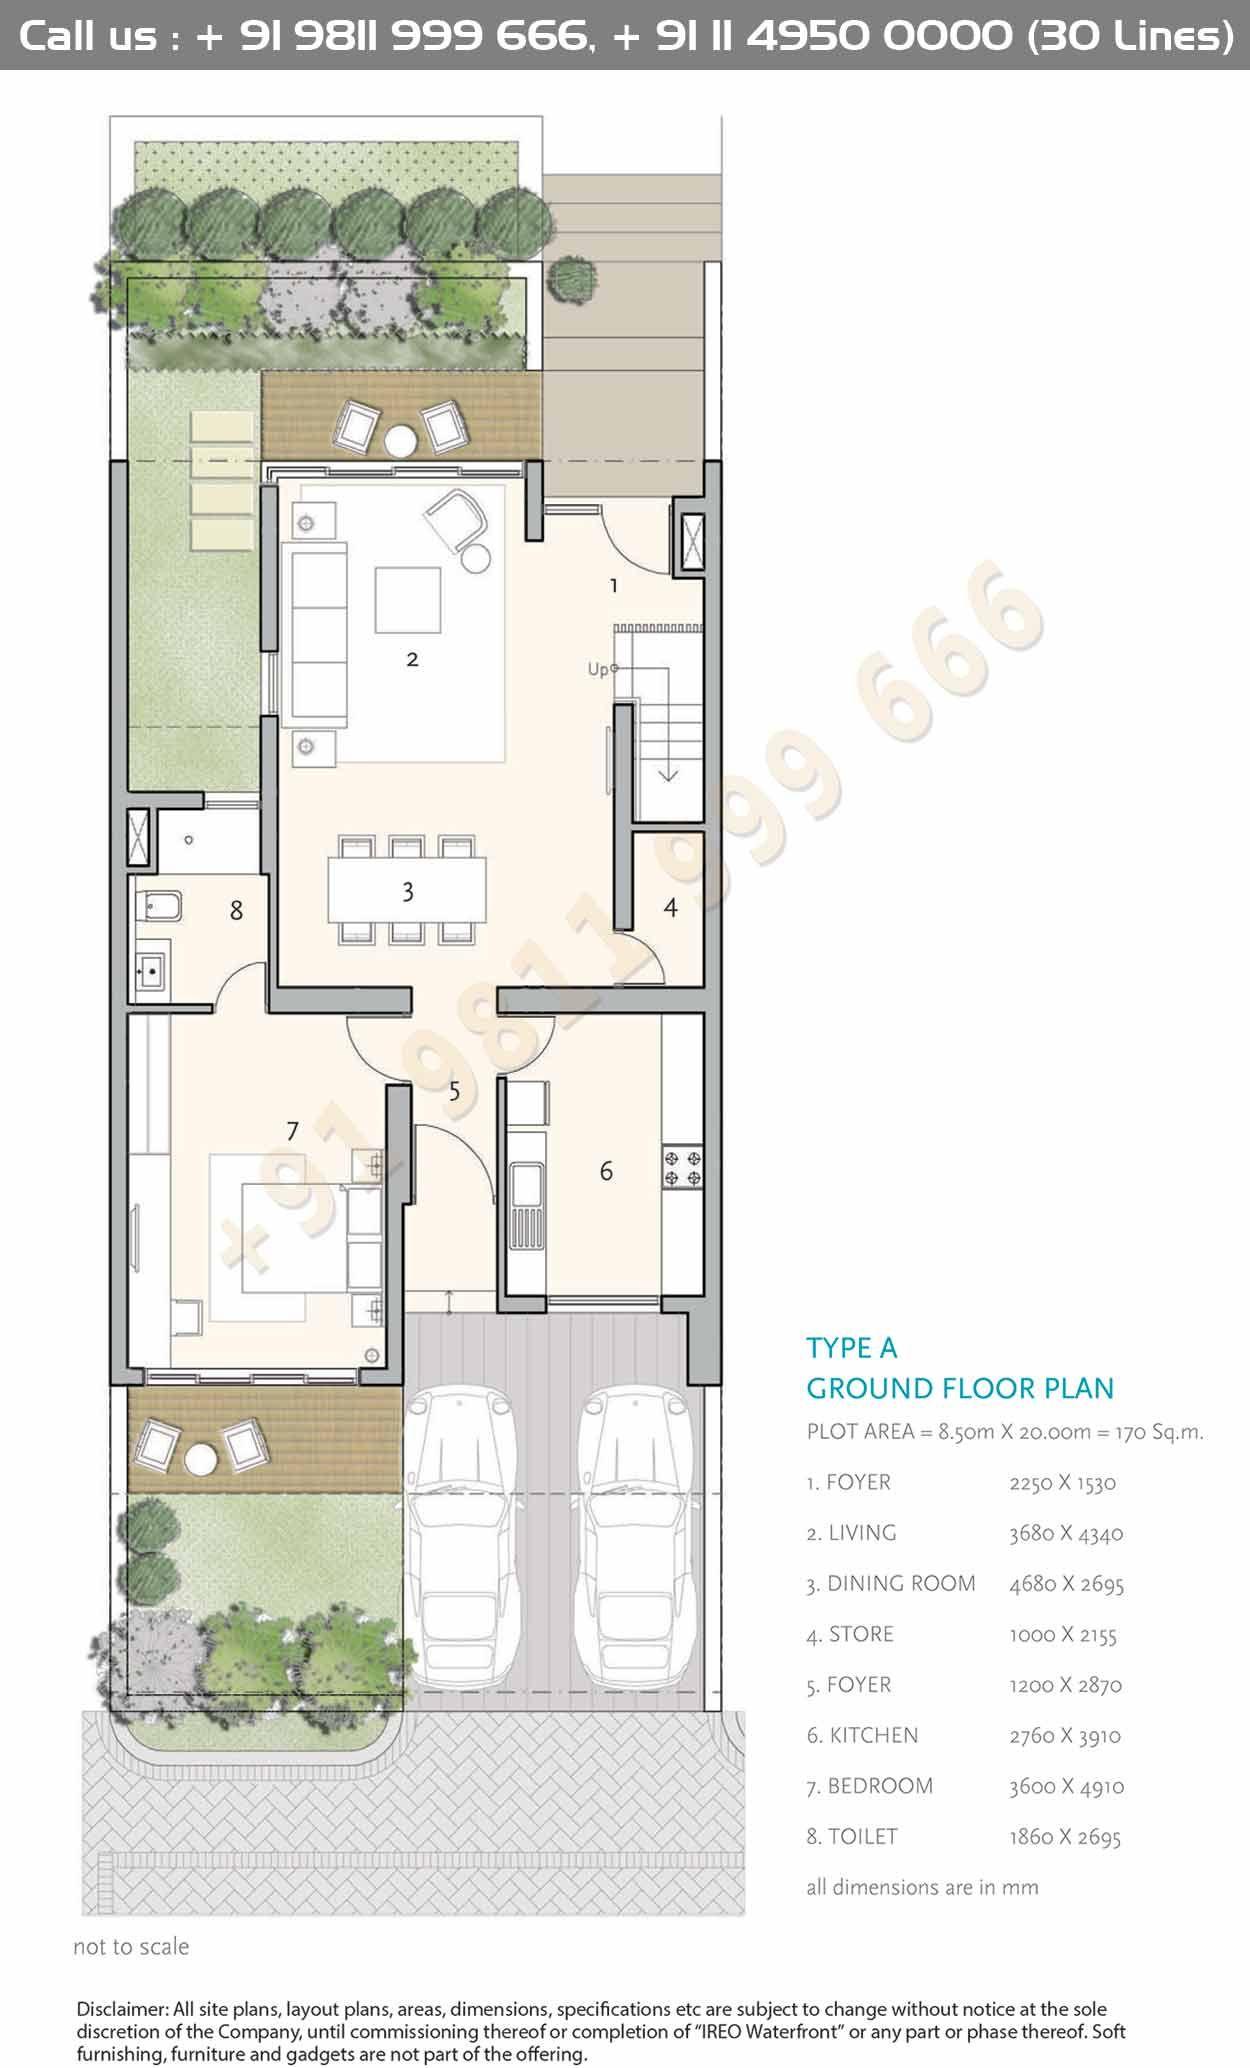 Ground Floor Plan Architectural Floor Plans House Construction Plan Minimal House Design